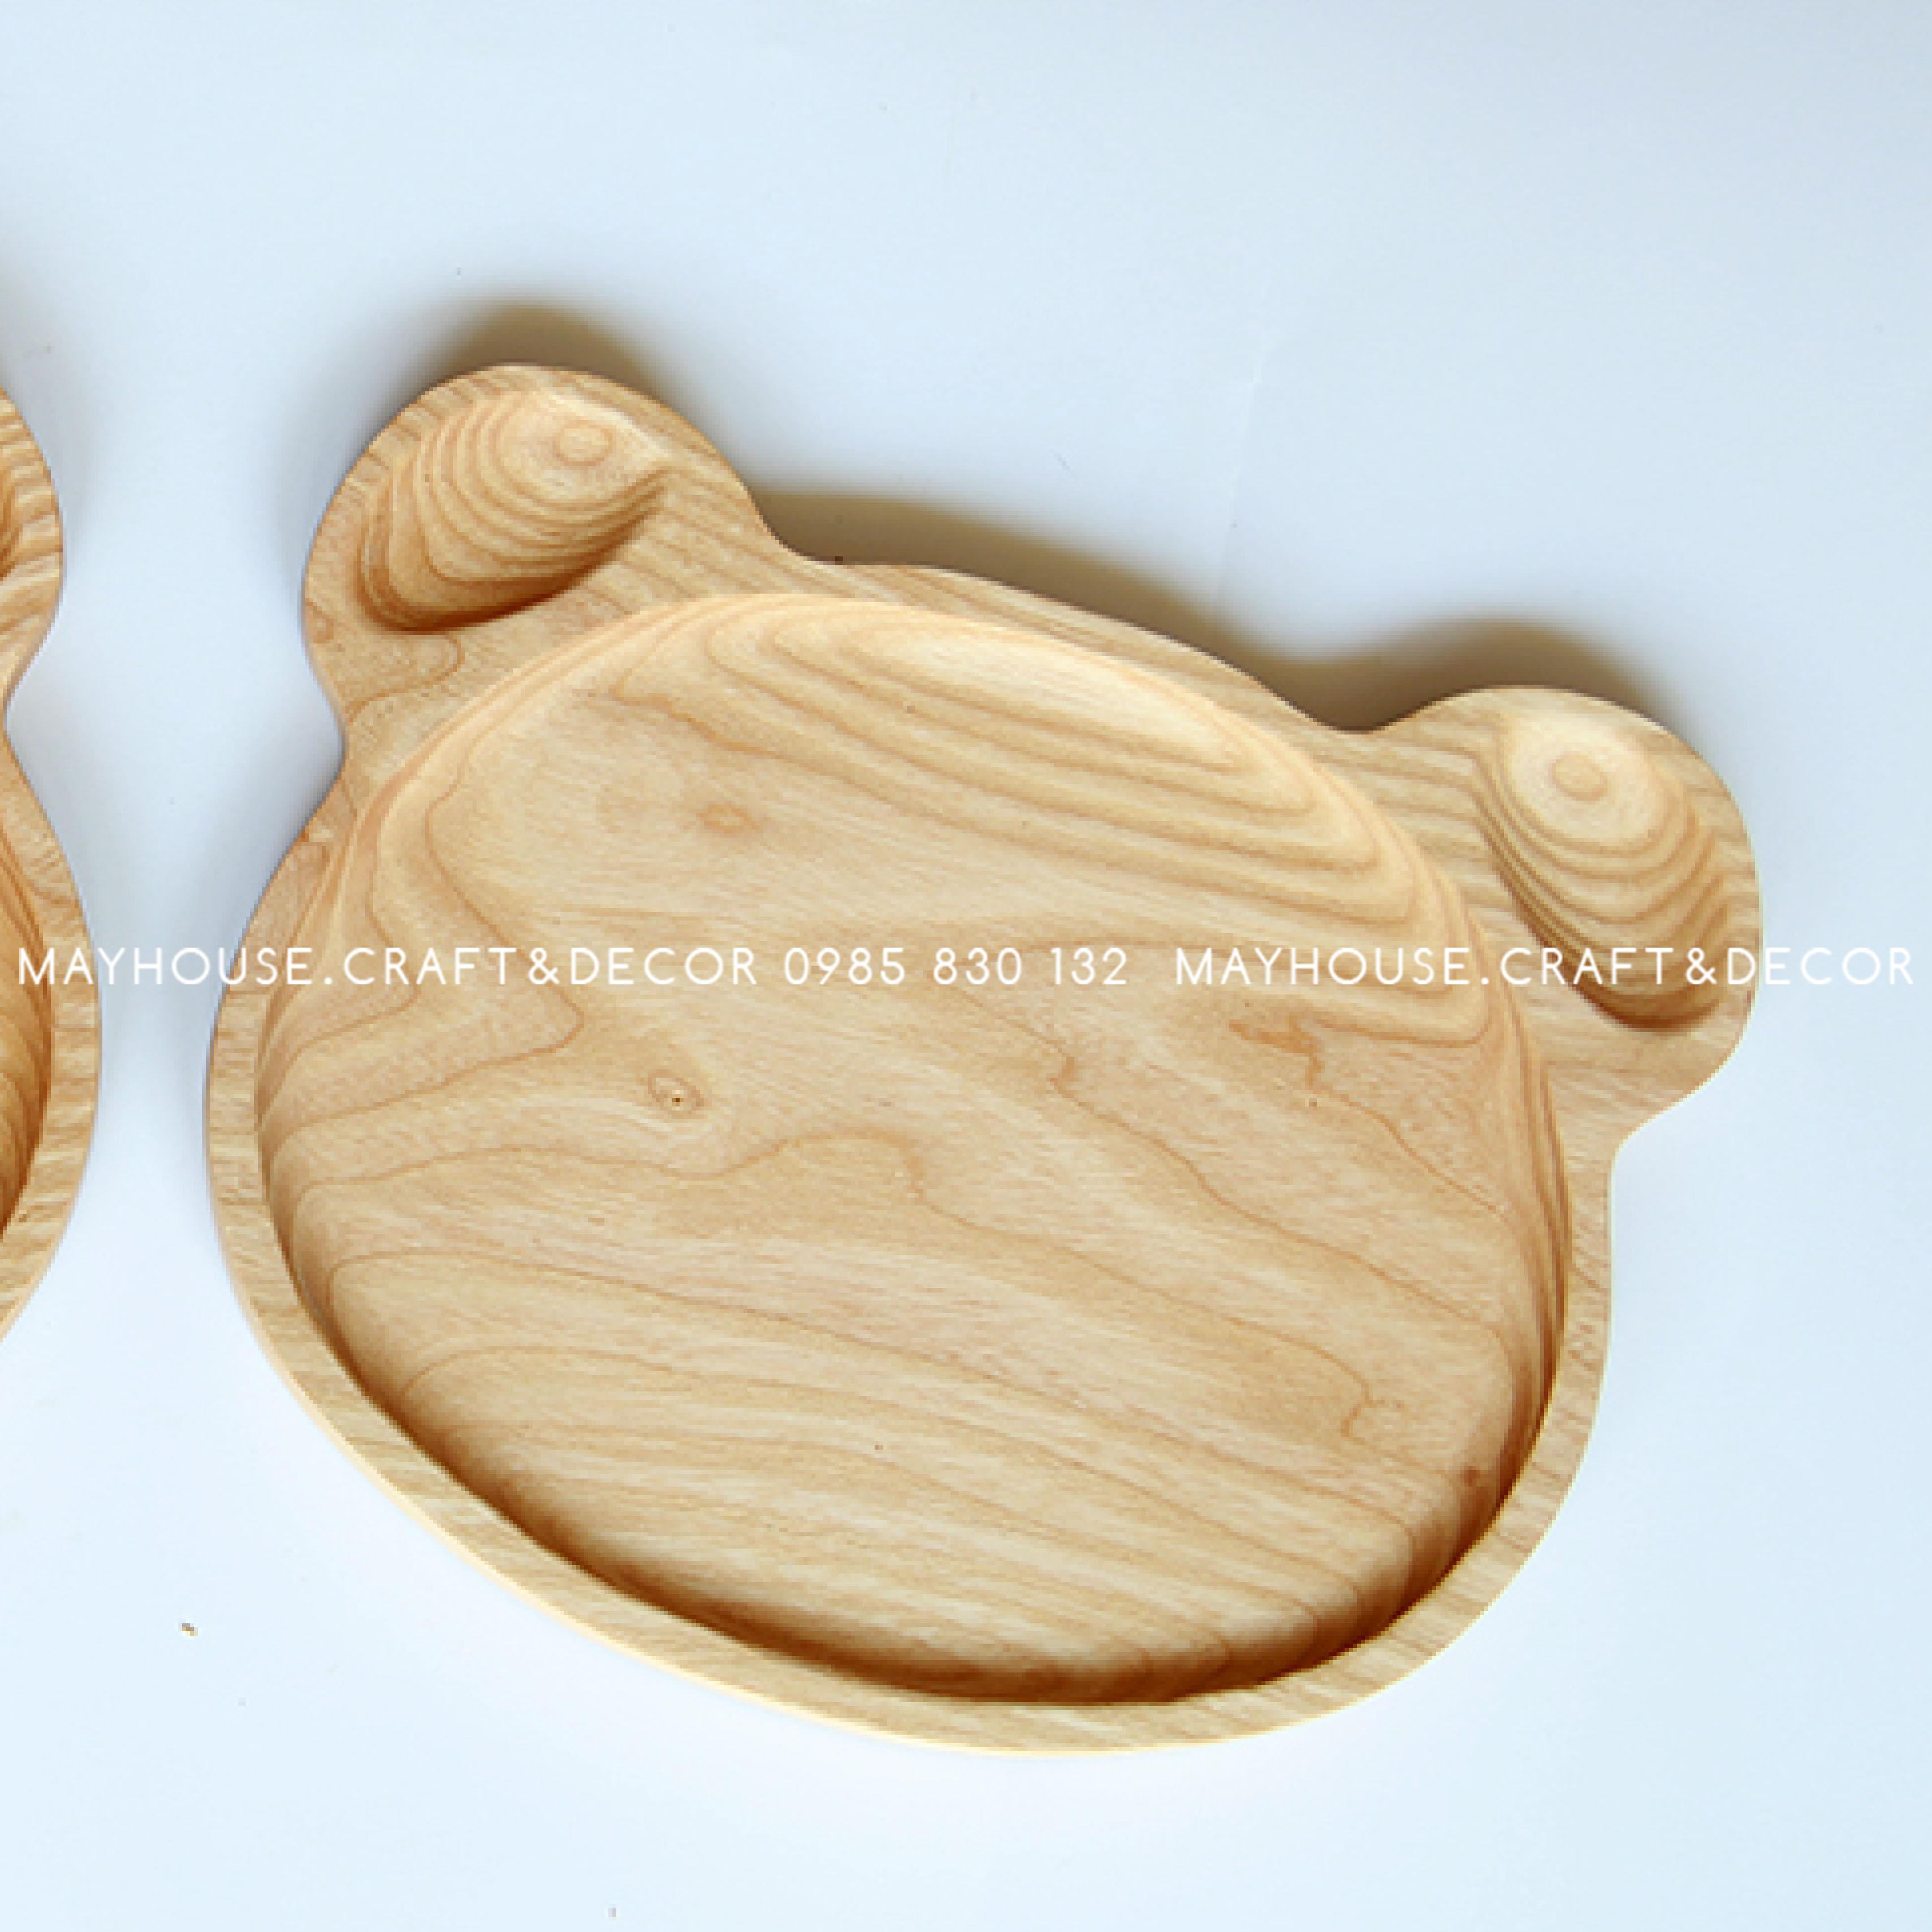 Khay gỗ mặt gấu